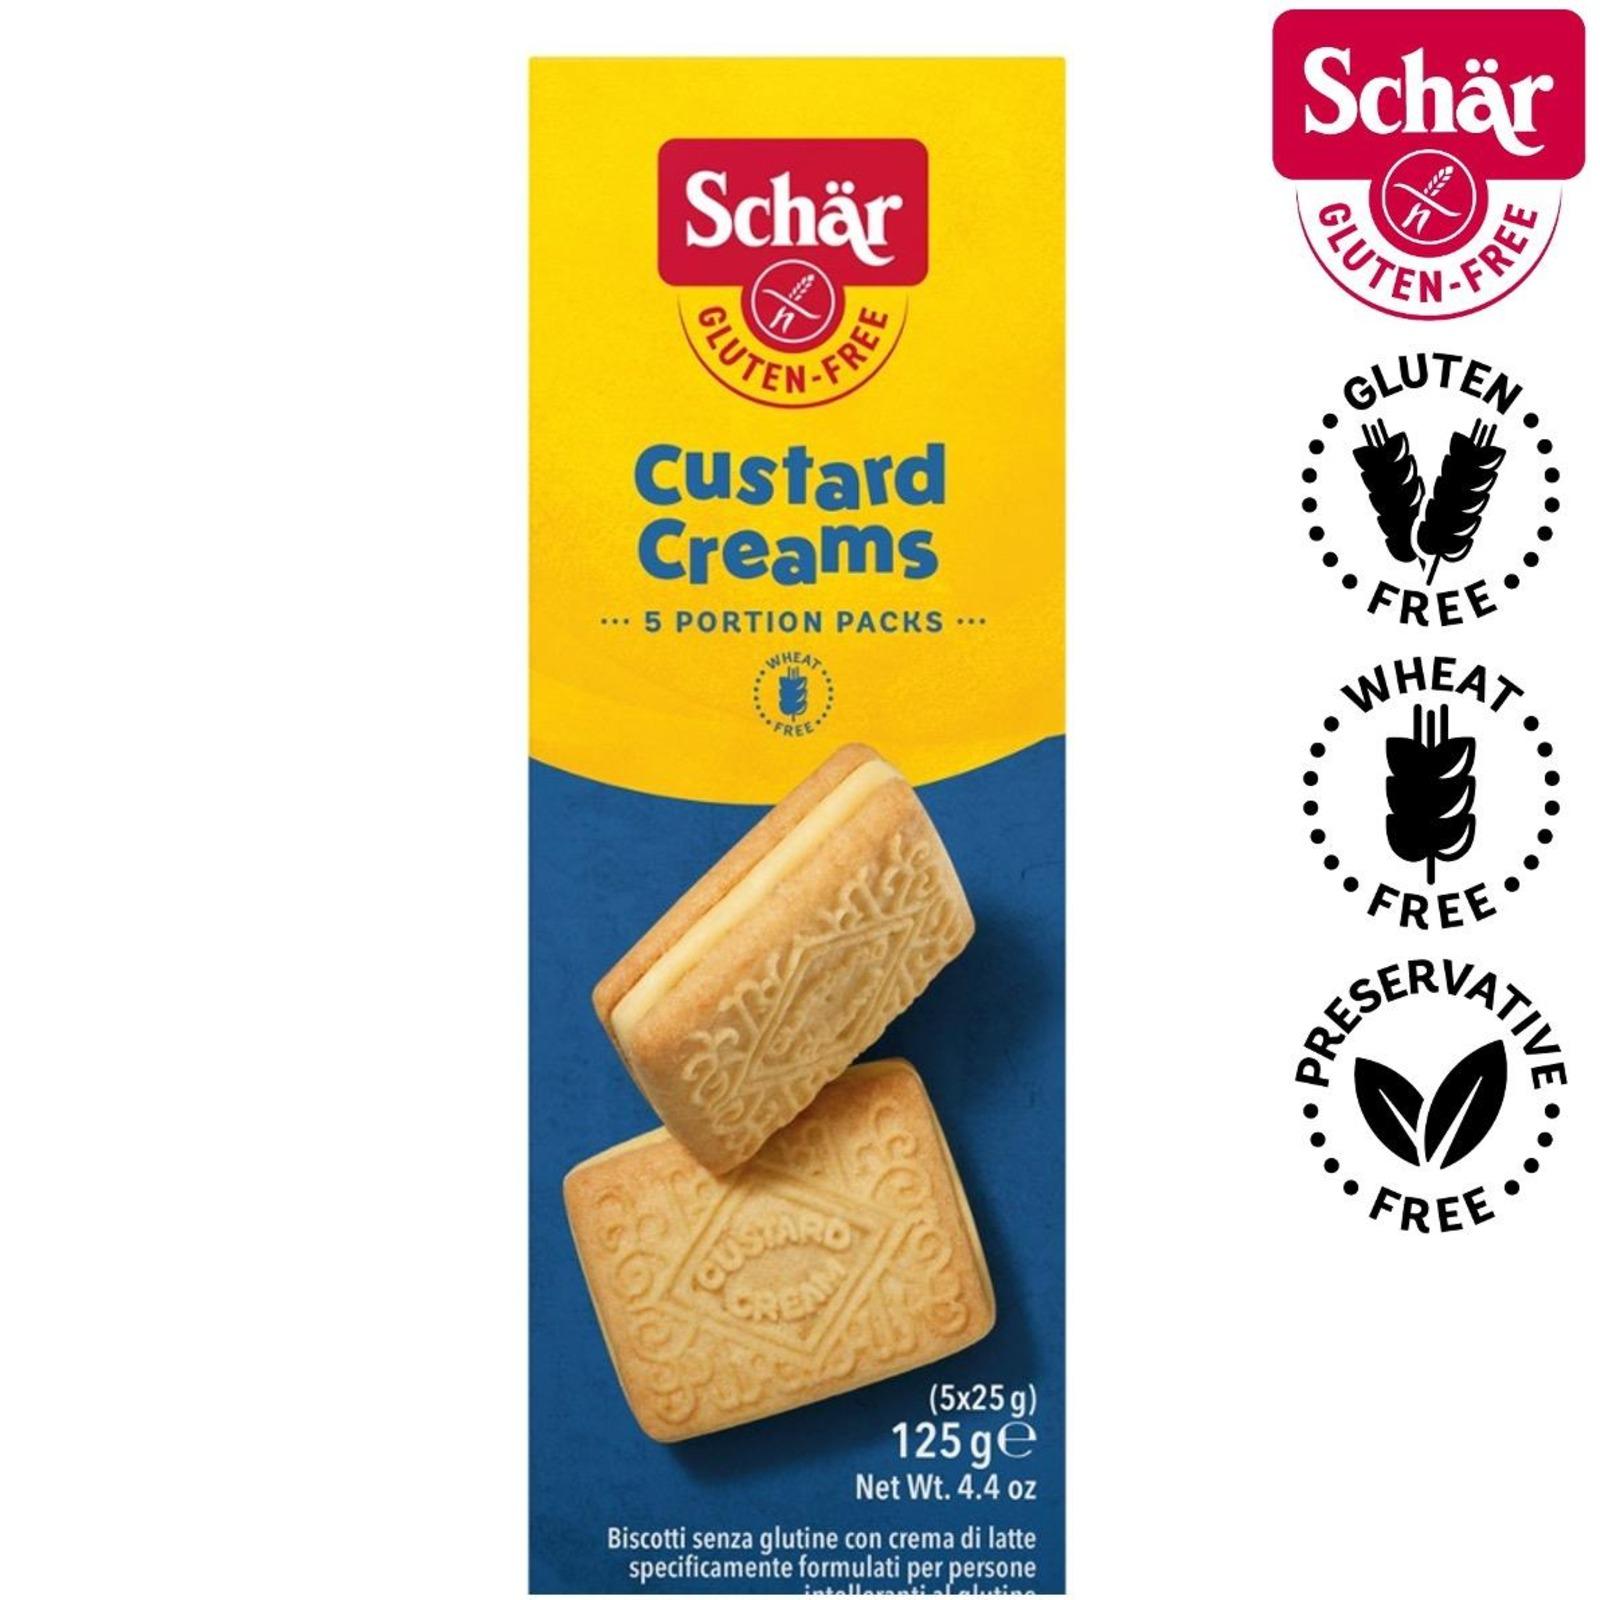 Dr. Schar Custard Cream Cookies - Gluten Free